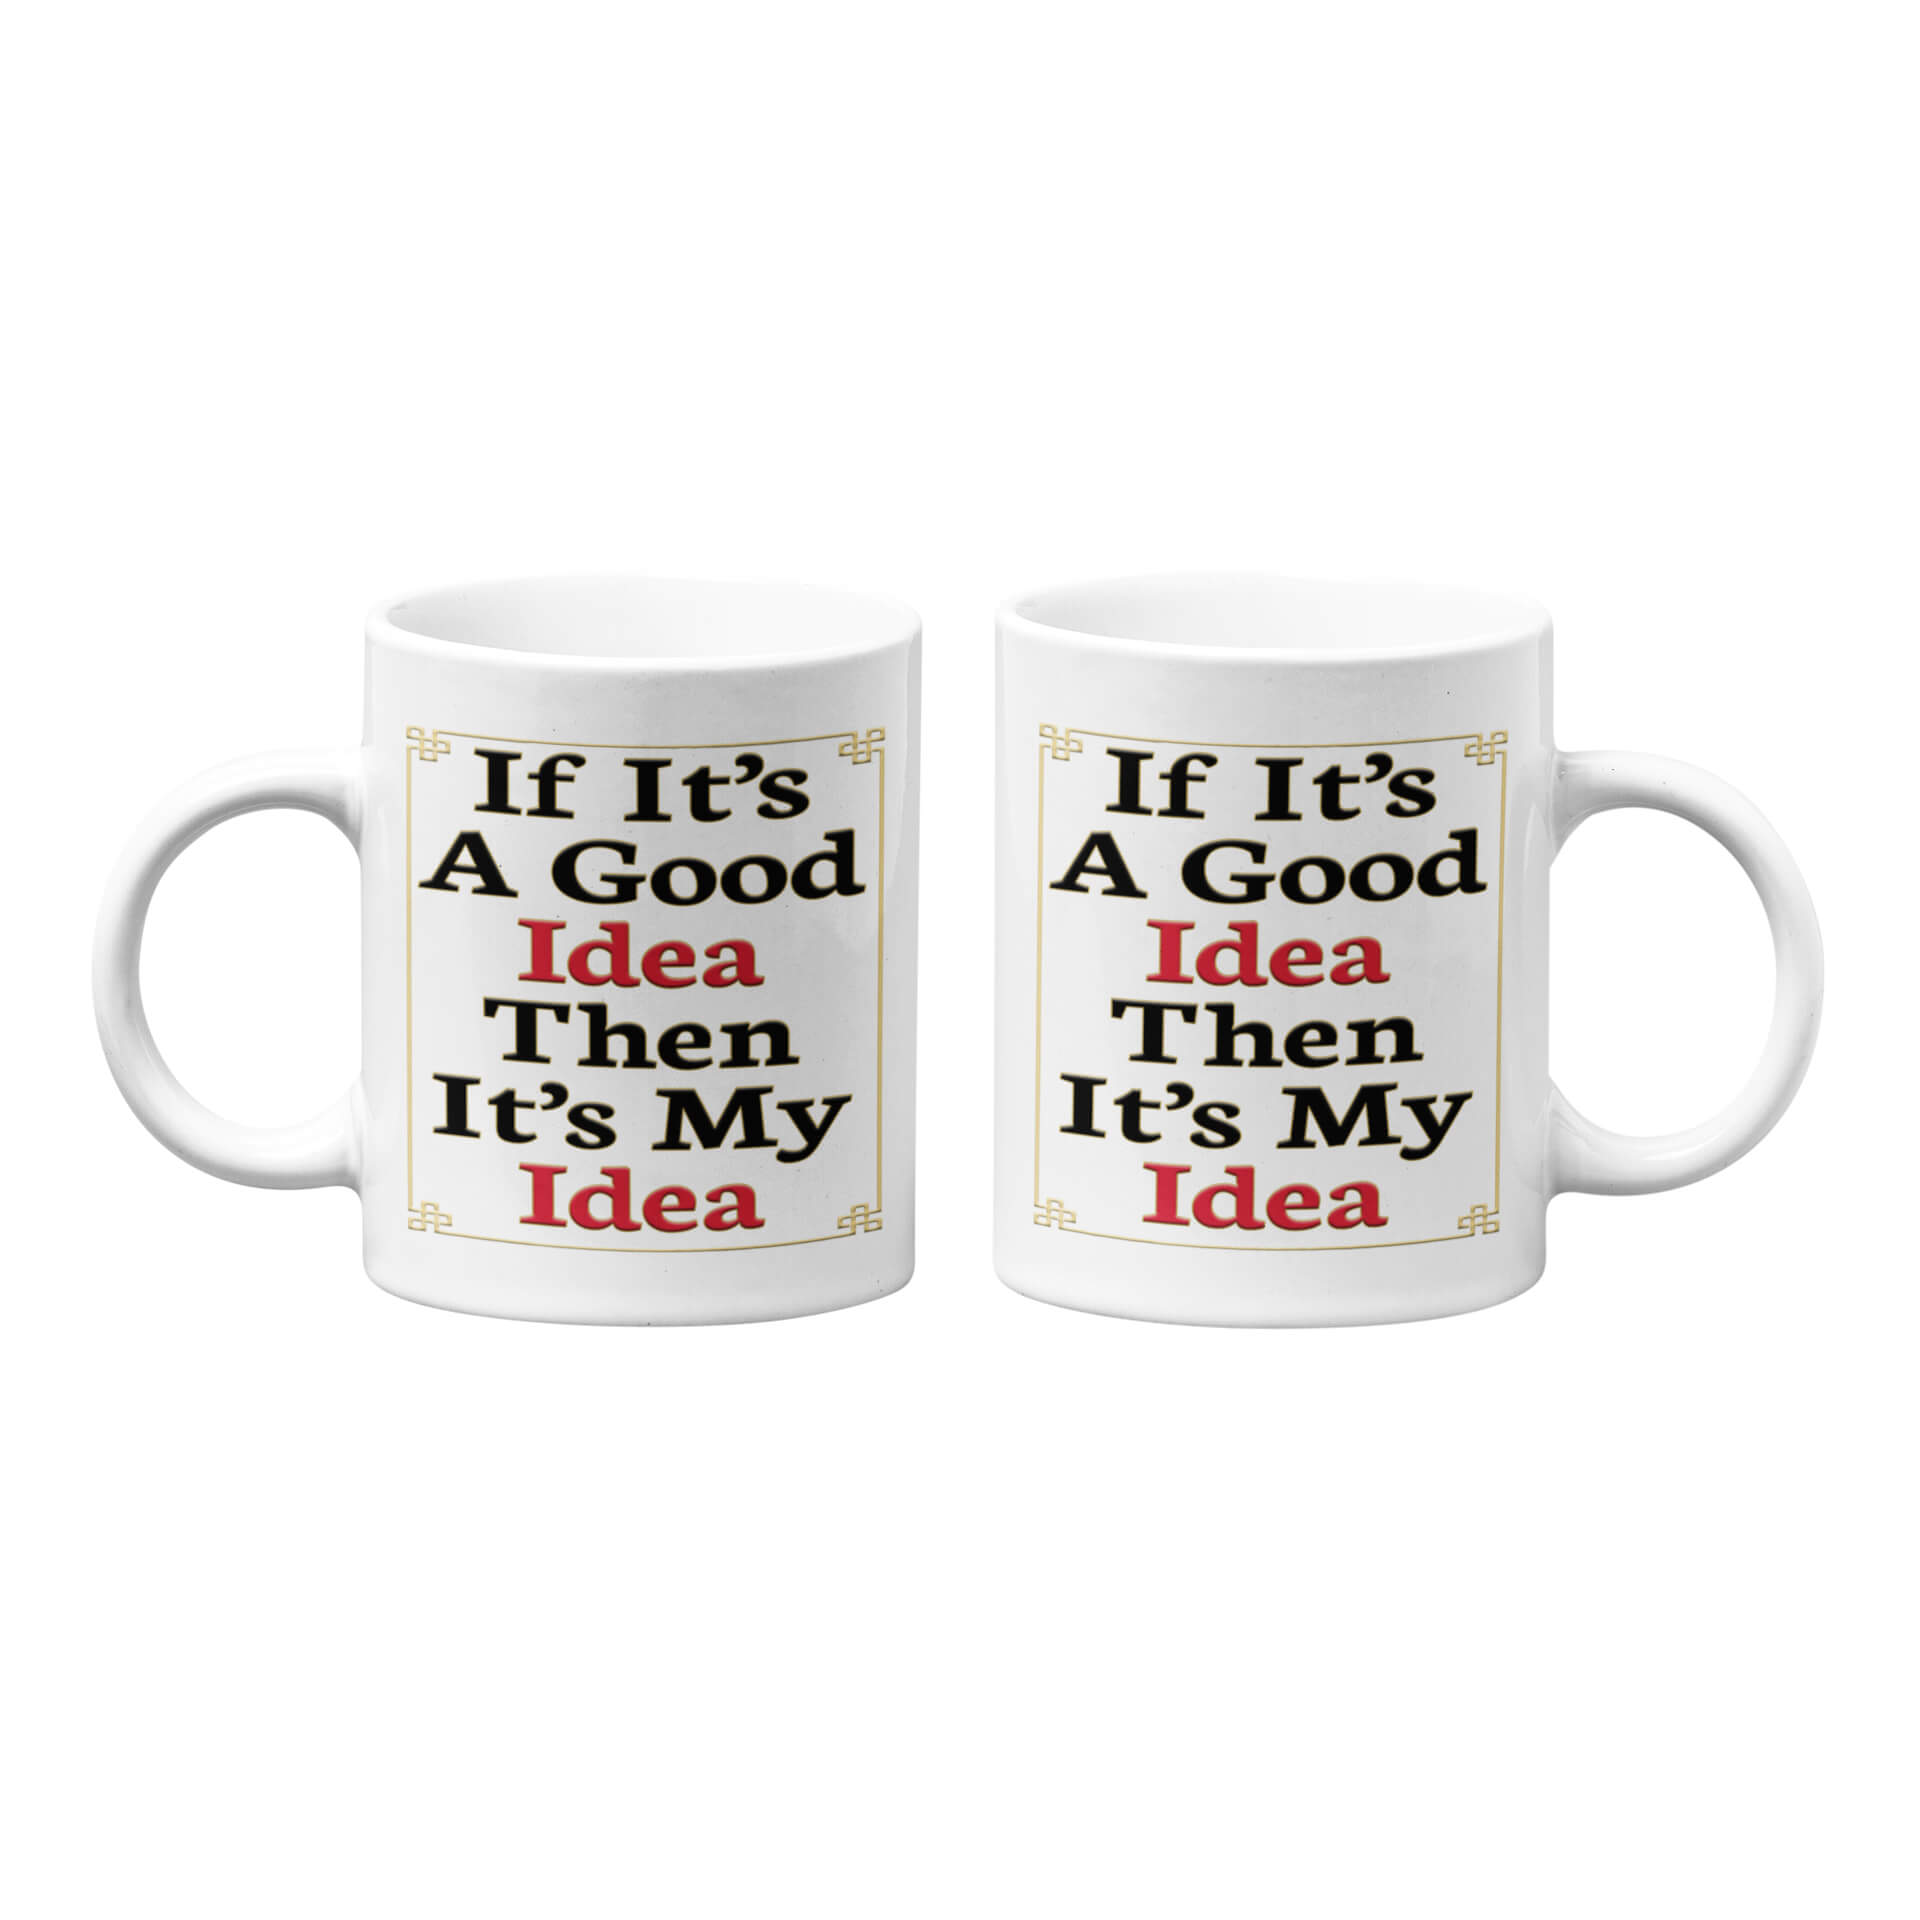 If It's A Good Idea Then It's My Idea Mug